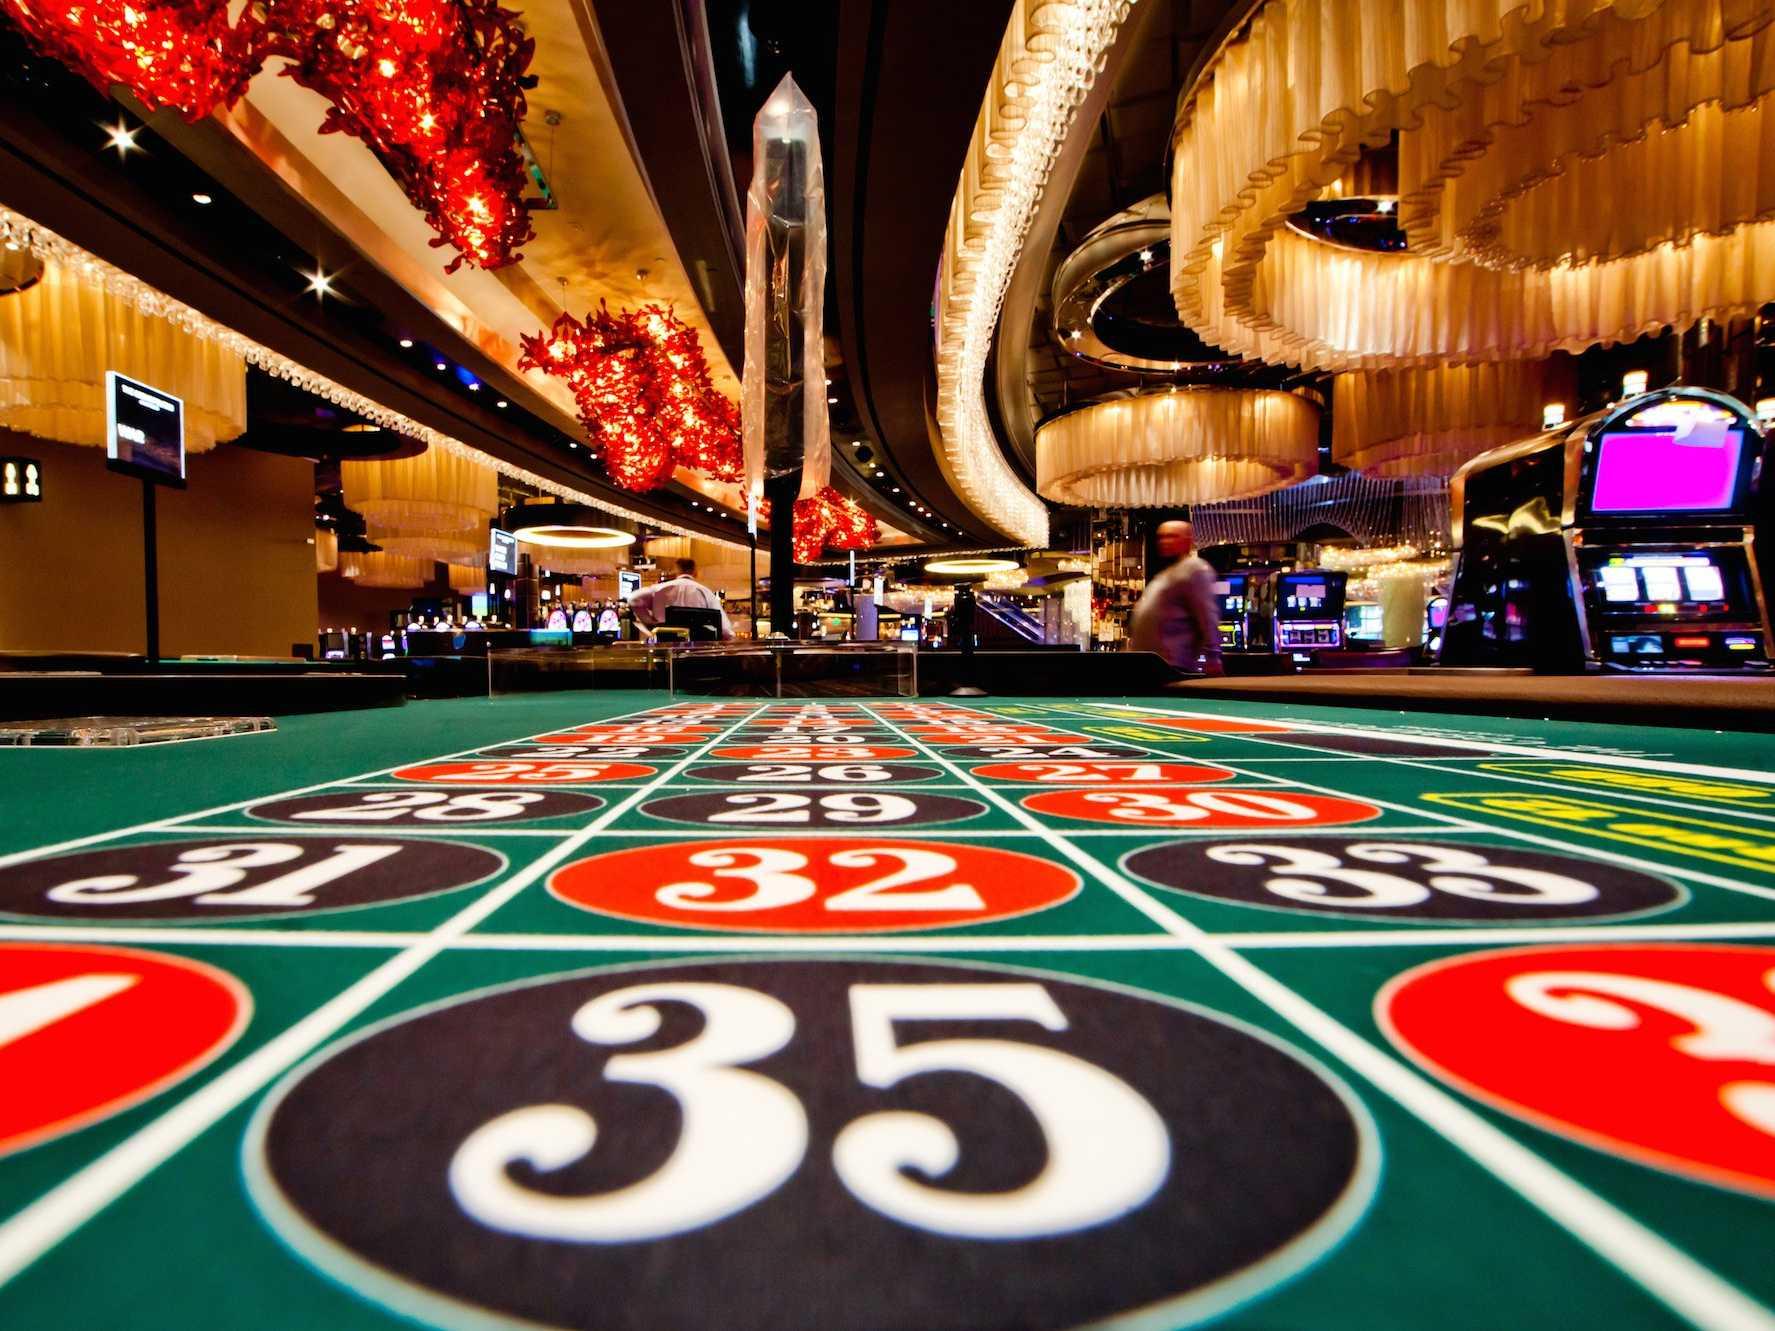 Casino en ligne : gagner des suppléments d'argent